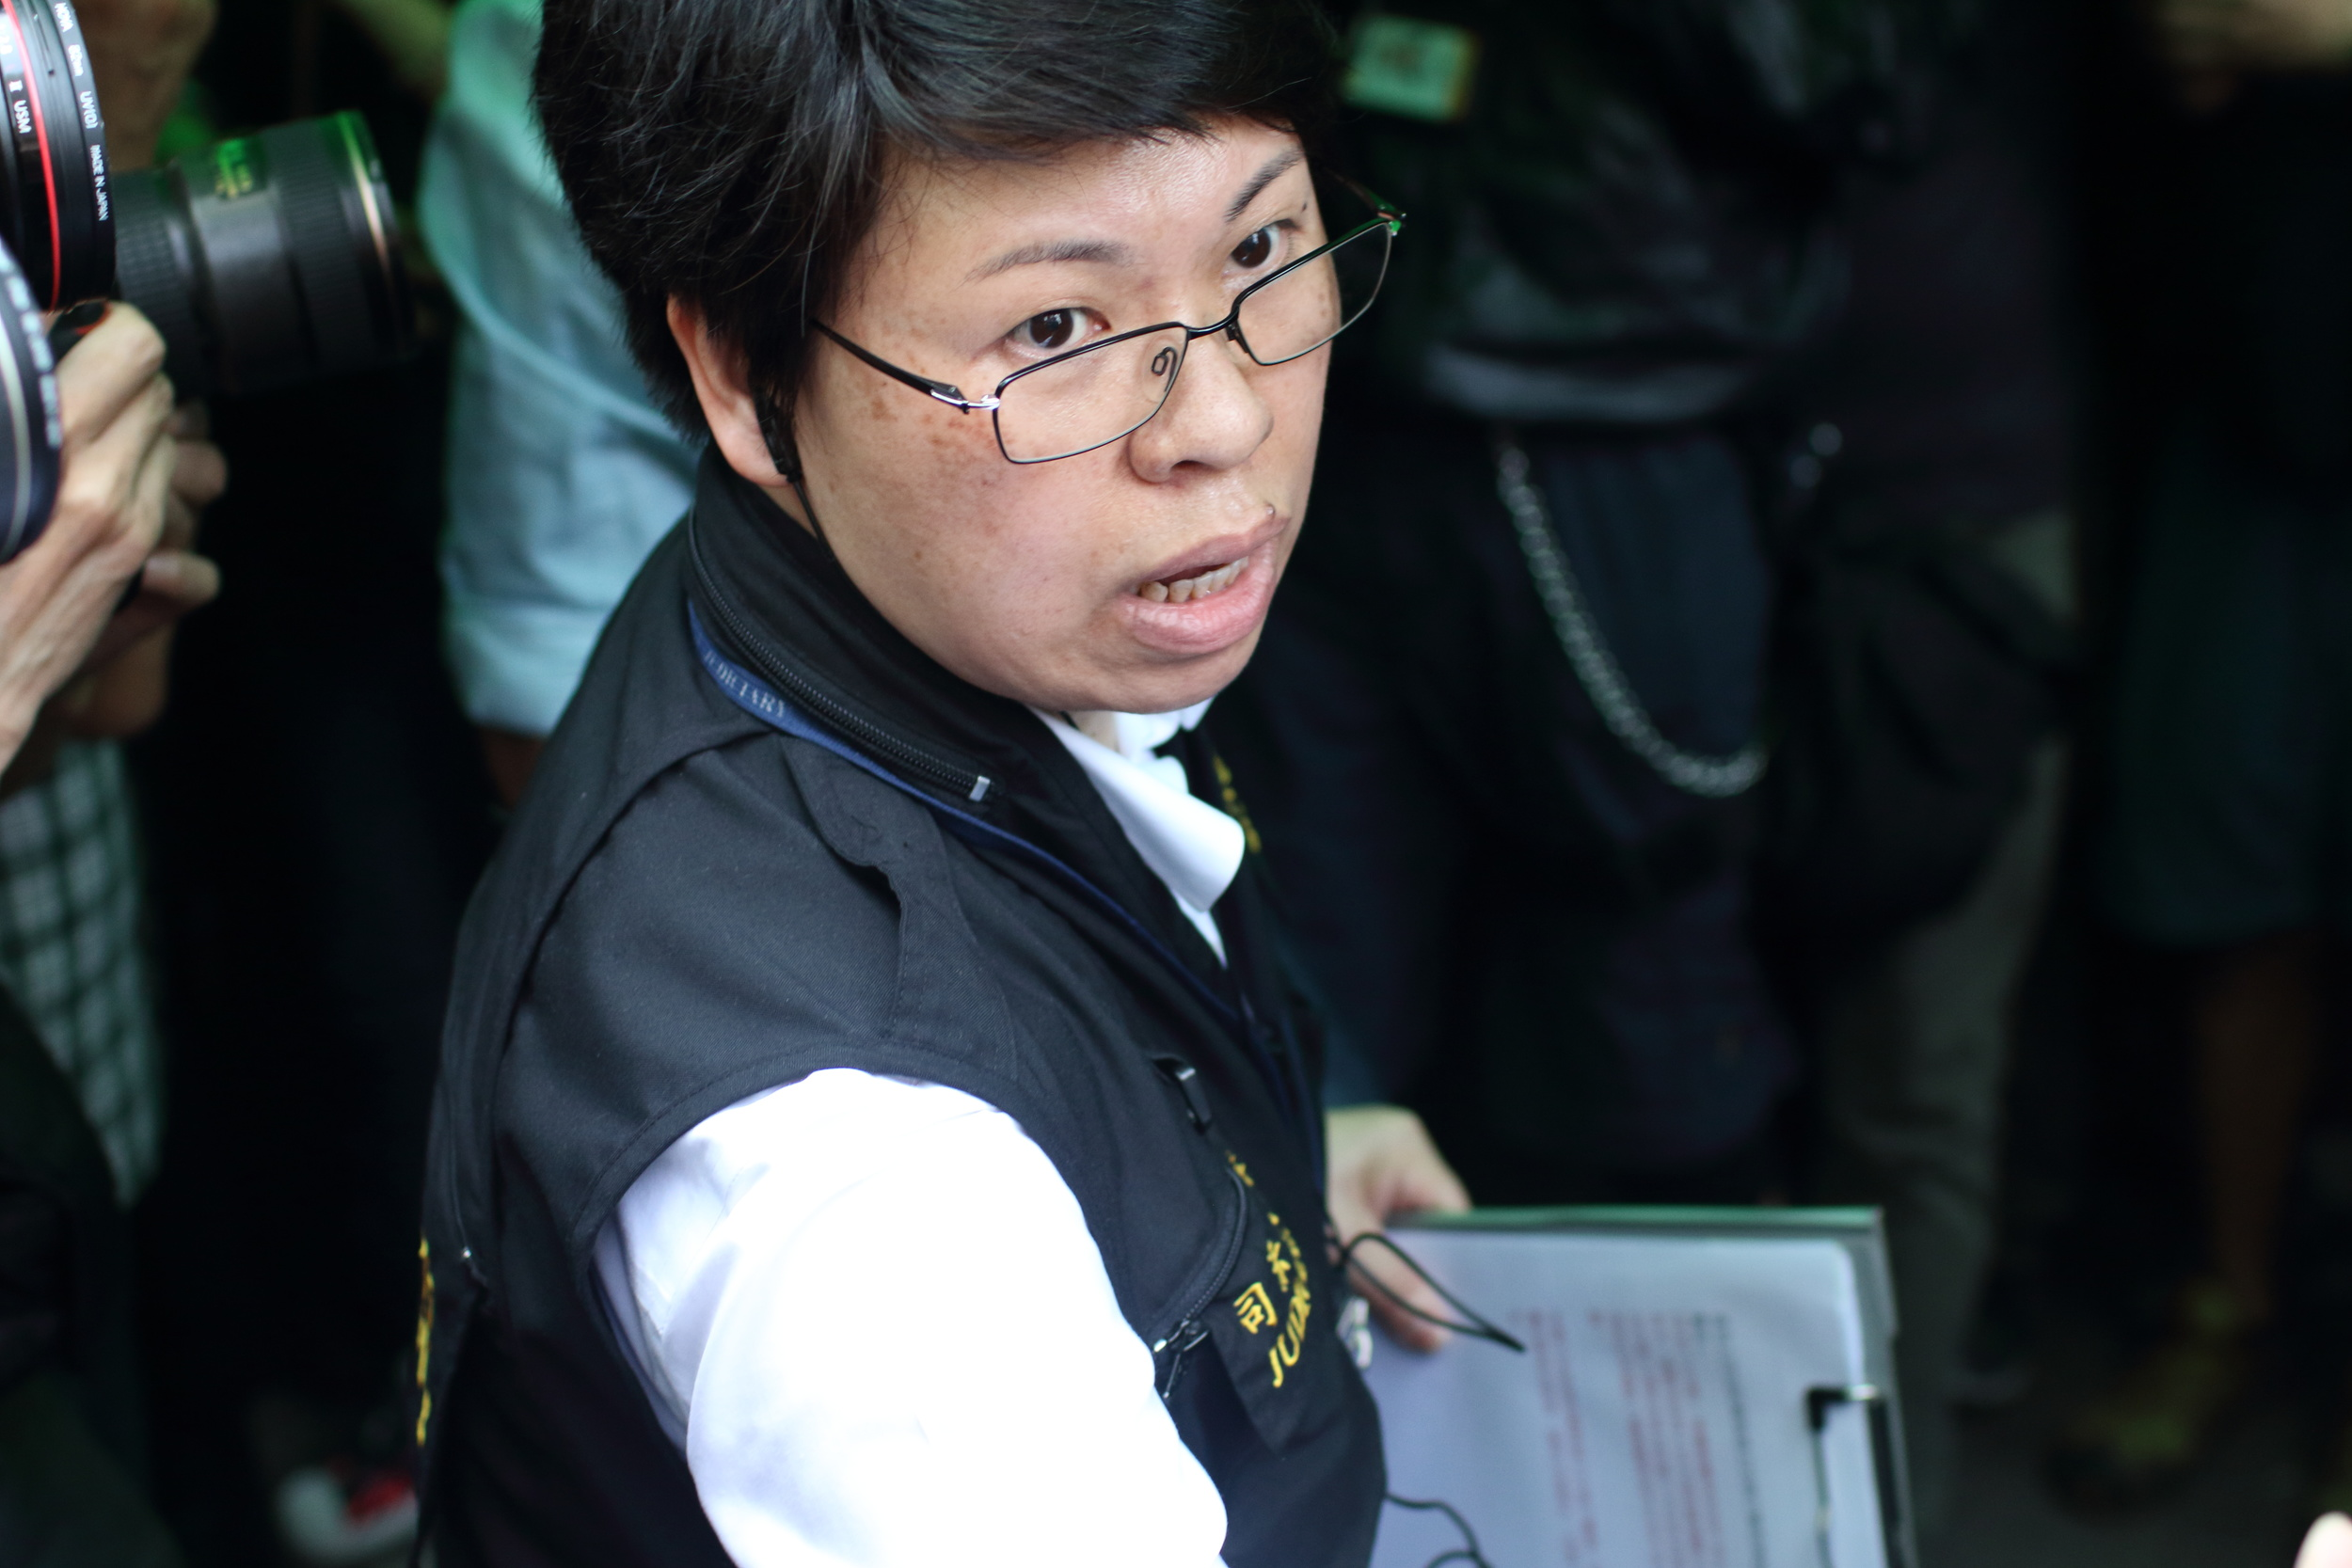 jfung1 Mongkok Argyle Clearance25.JPG